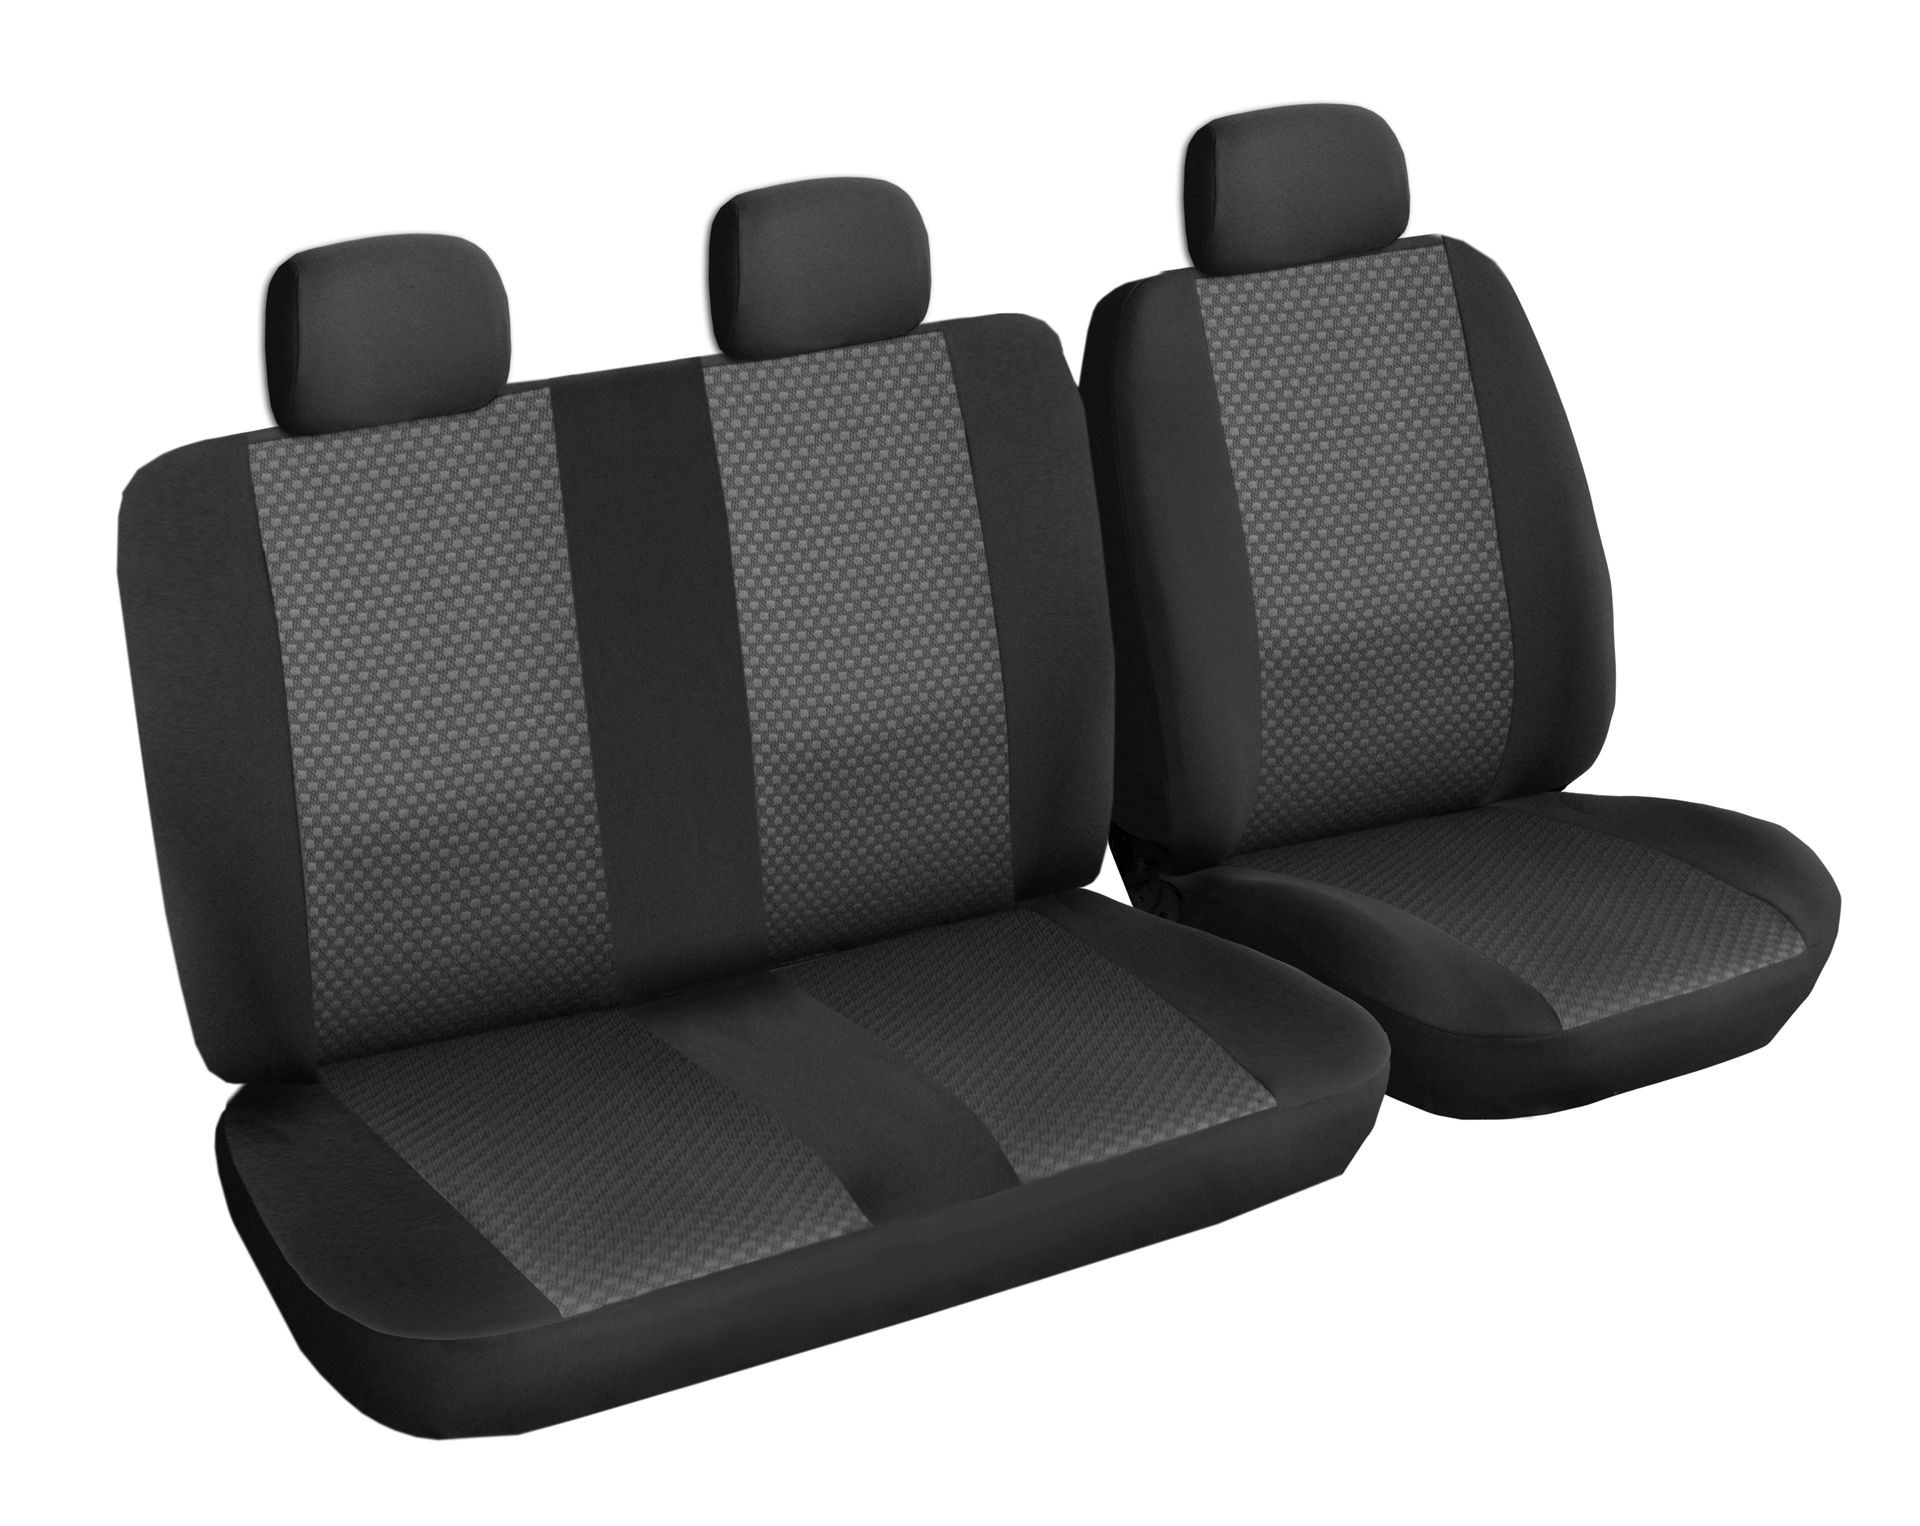 Autopotahy PEUGEOT EXPERT III, Citroën Jumpy III 3 místa, od r. 2016, černé SIXTOL